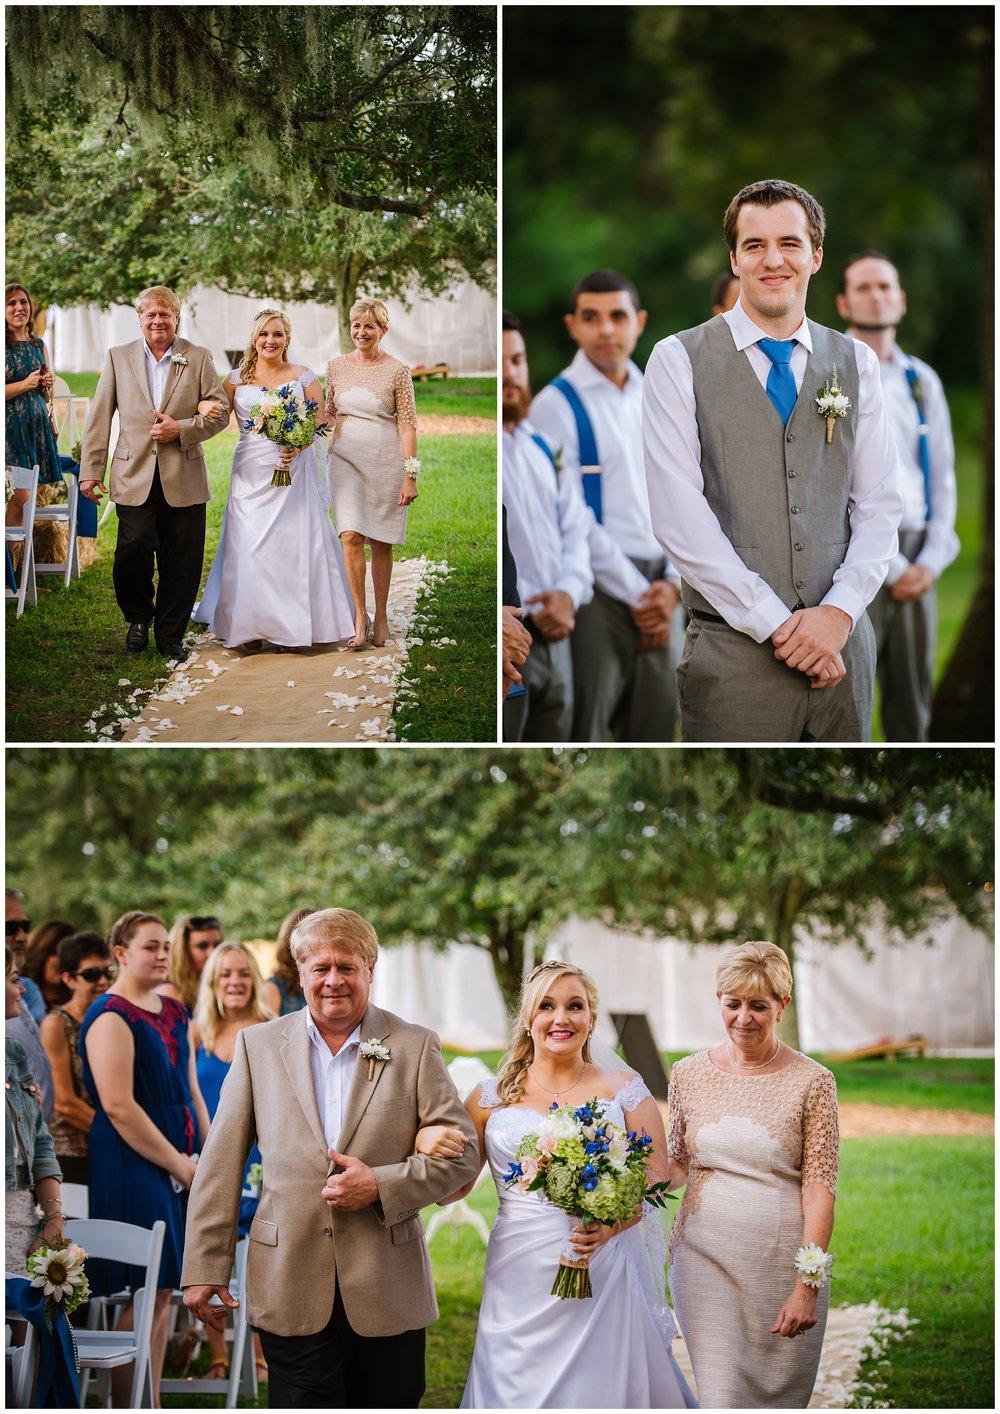 Cross-creek-ranch-navy-bush-tampa-wedding-photogrpaher_0024.jpg